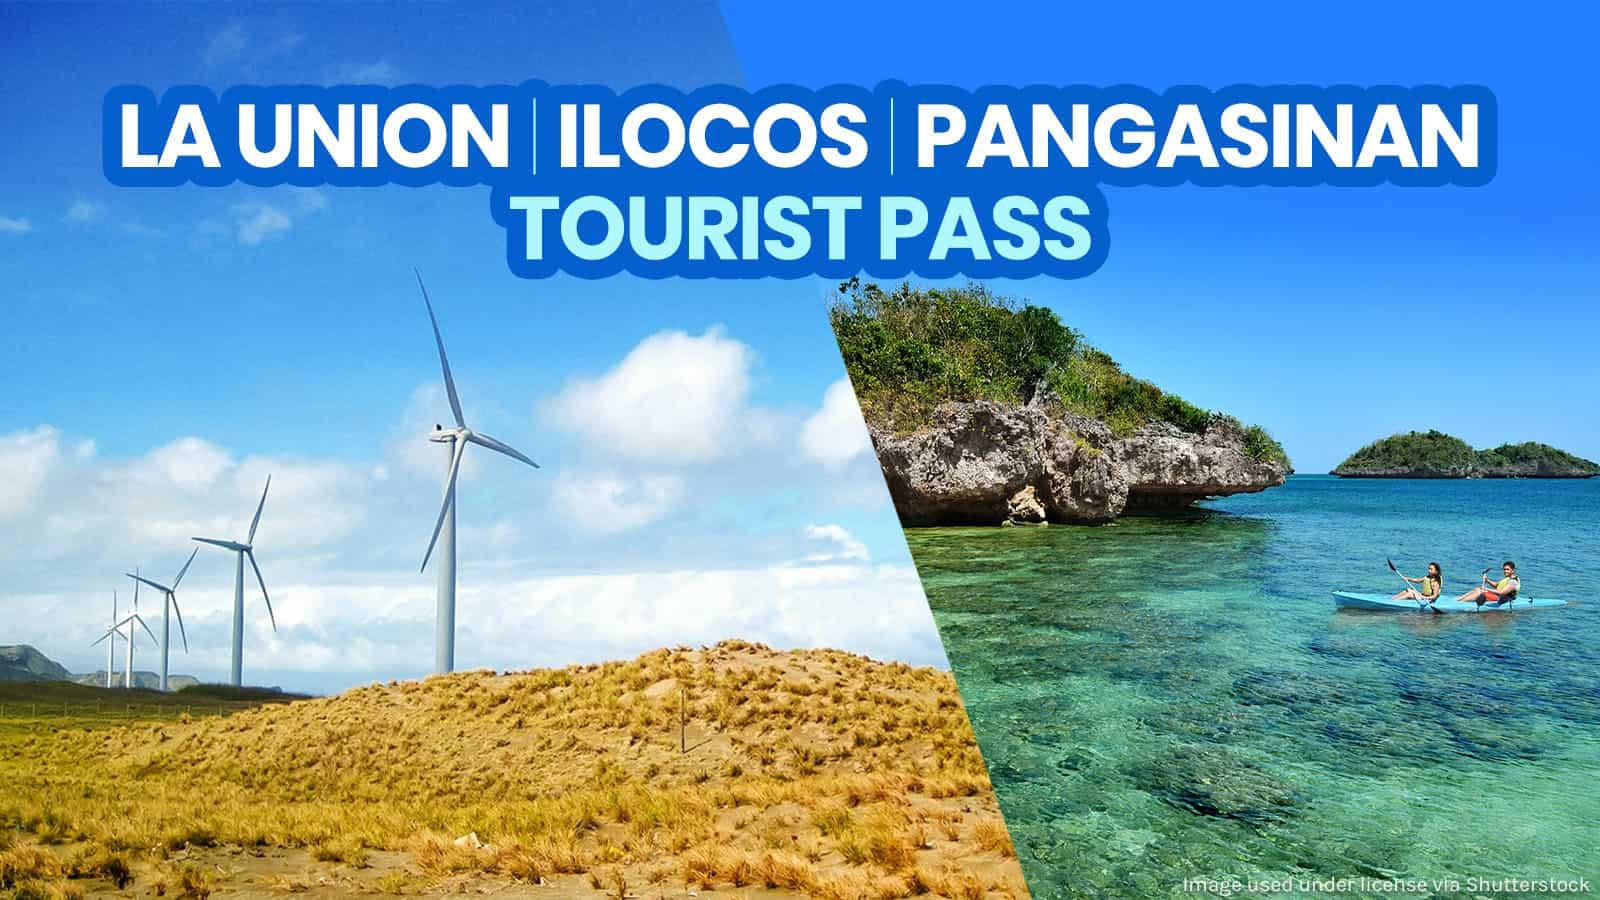 2021 How to Get a Tourist Pass & Schedule for LA UNION, ILOCOS & PANGASINAN via Tara Na!